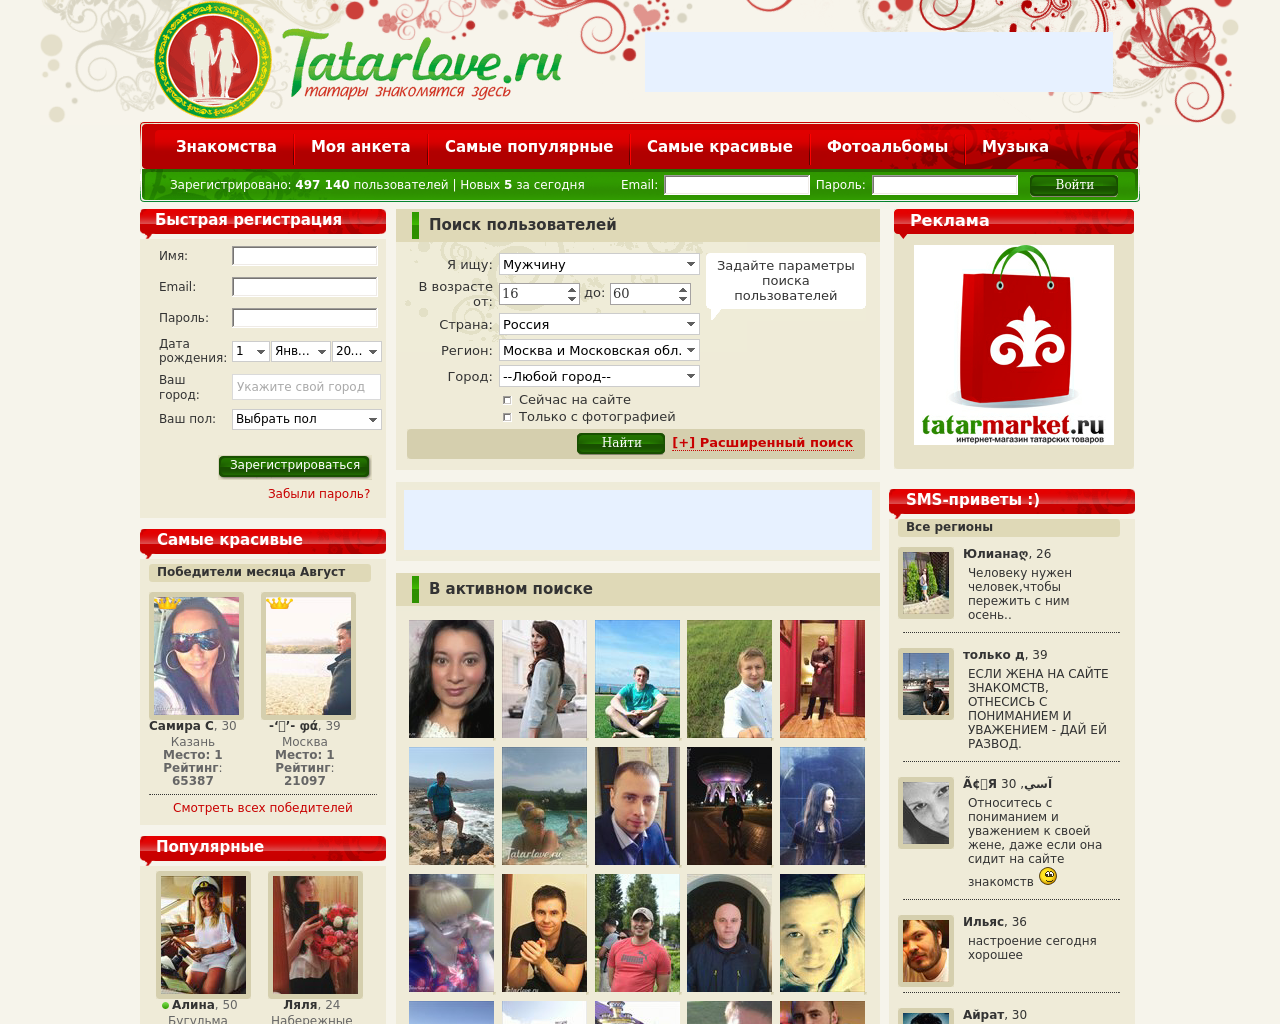 Татарский сайт знакомств татар лове